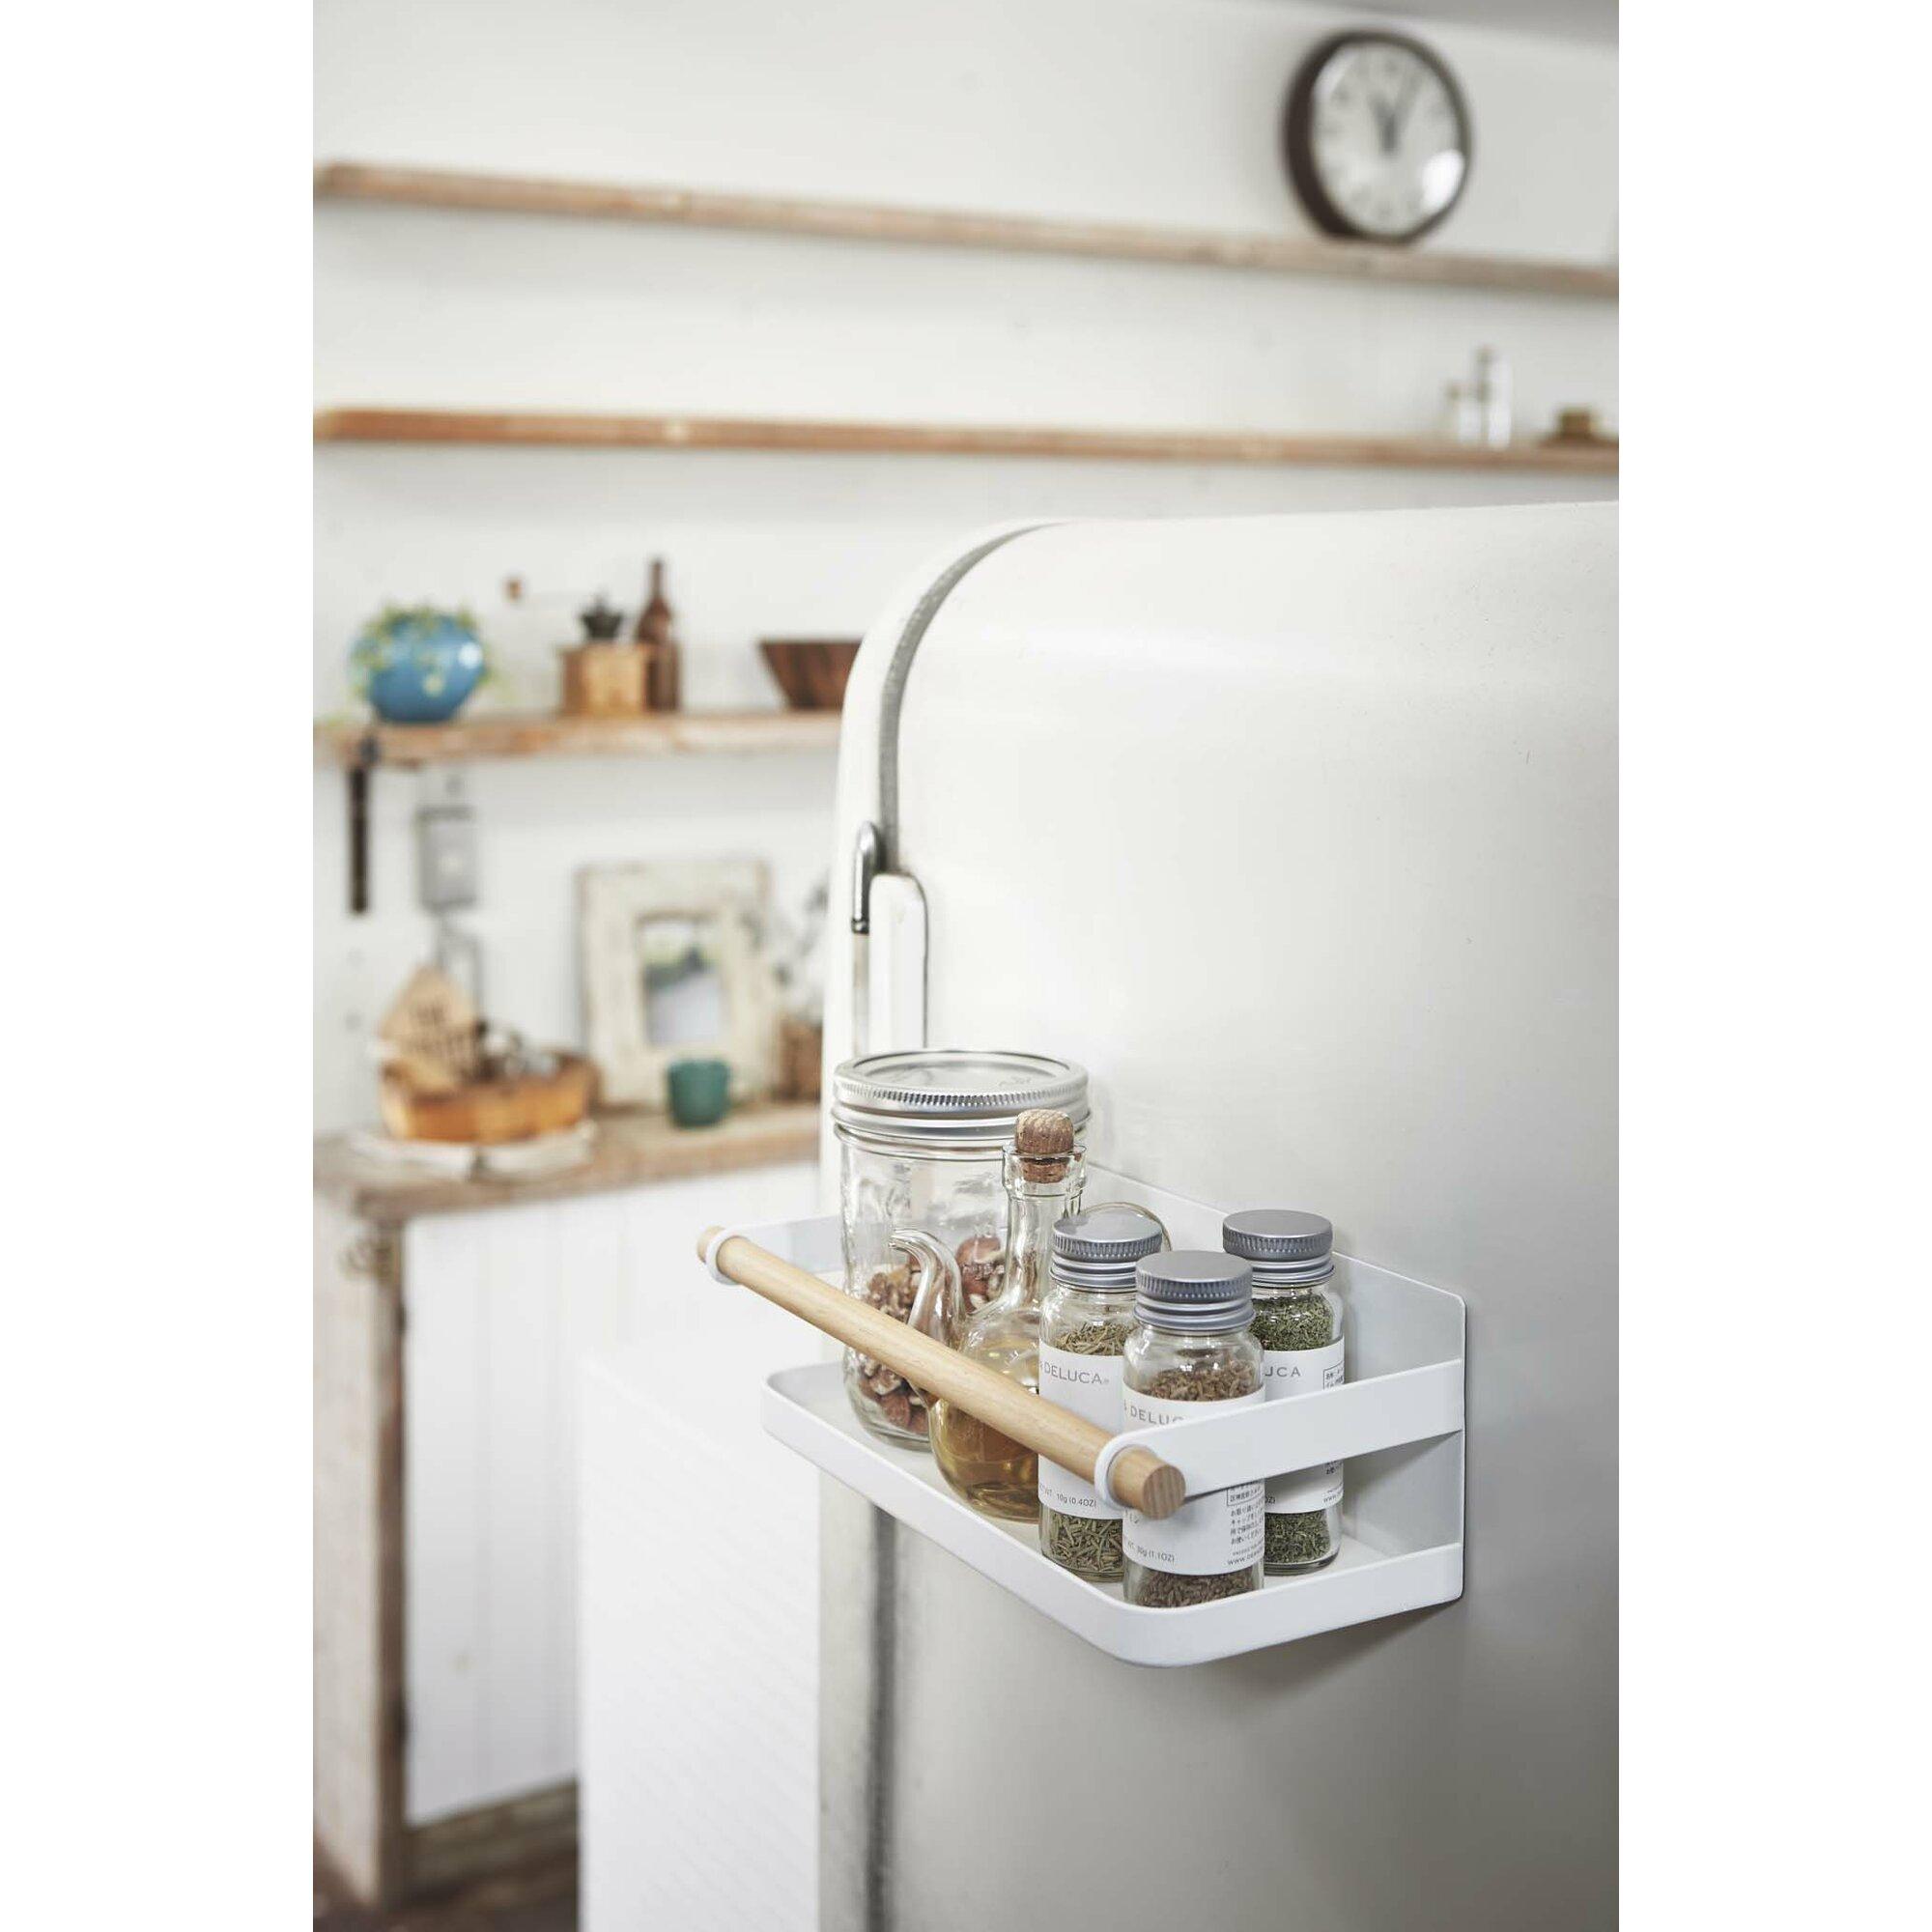 Magnetic spice racks for kitchen - Tosca Magnetic Spice Rack